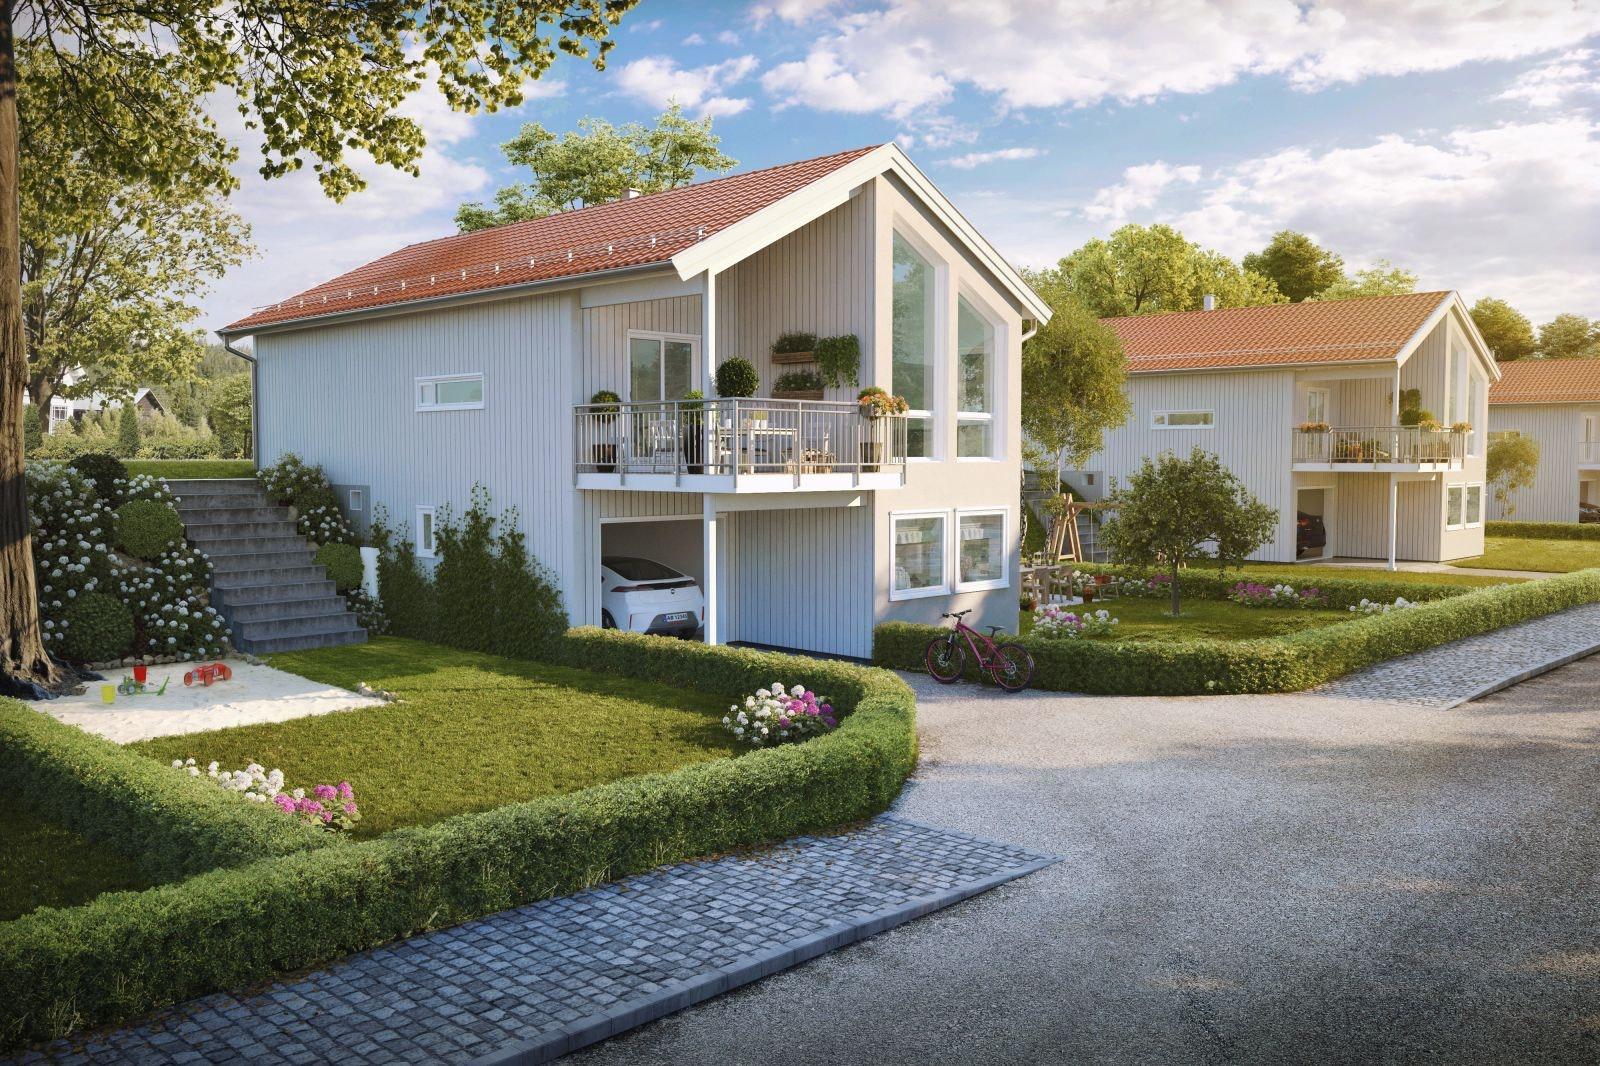 BYBRUA - Moderne og stilige Berga med 3 soverom - Garasje med direkte adkomst til huset.